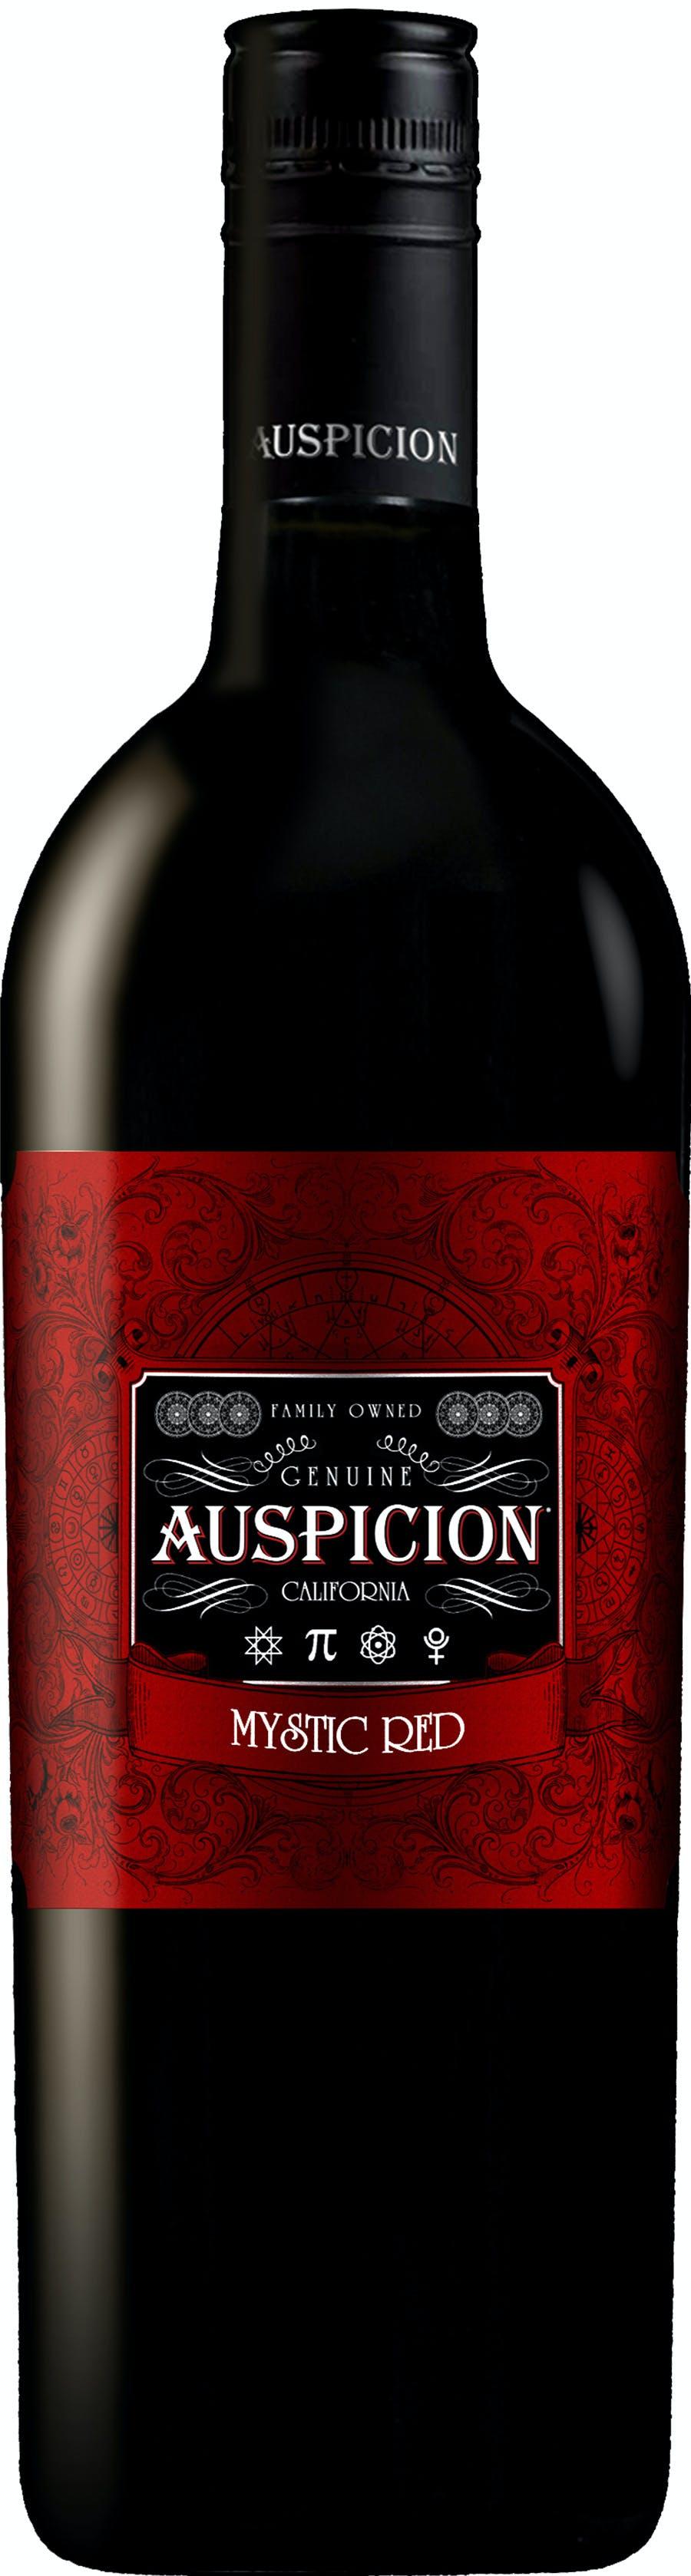 Auspicion Mystic Red Stirling Fine Wines